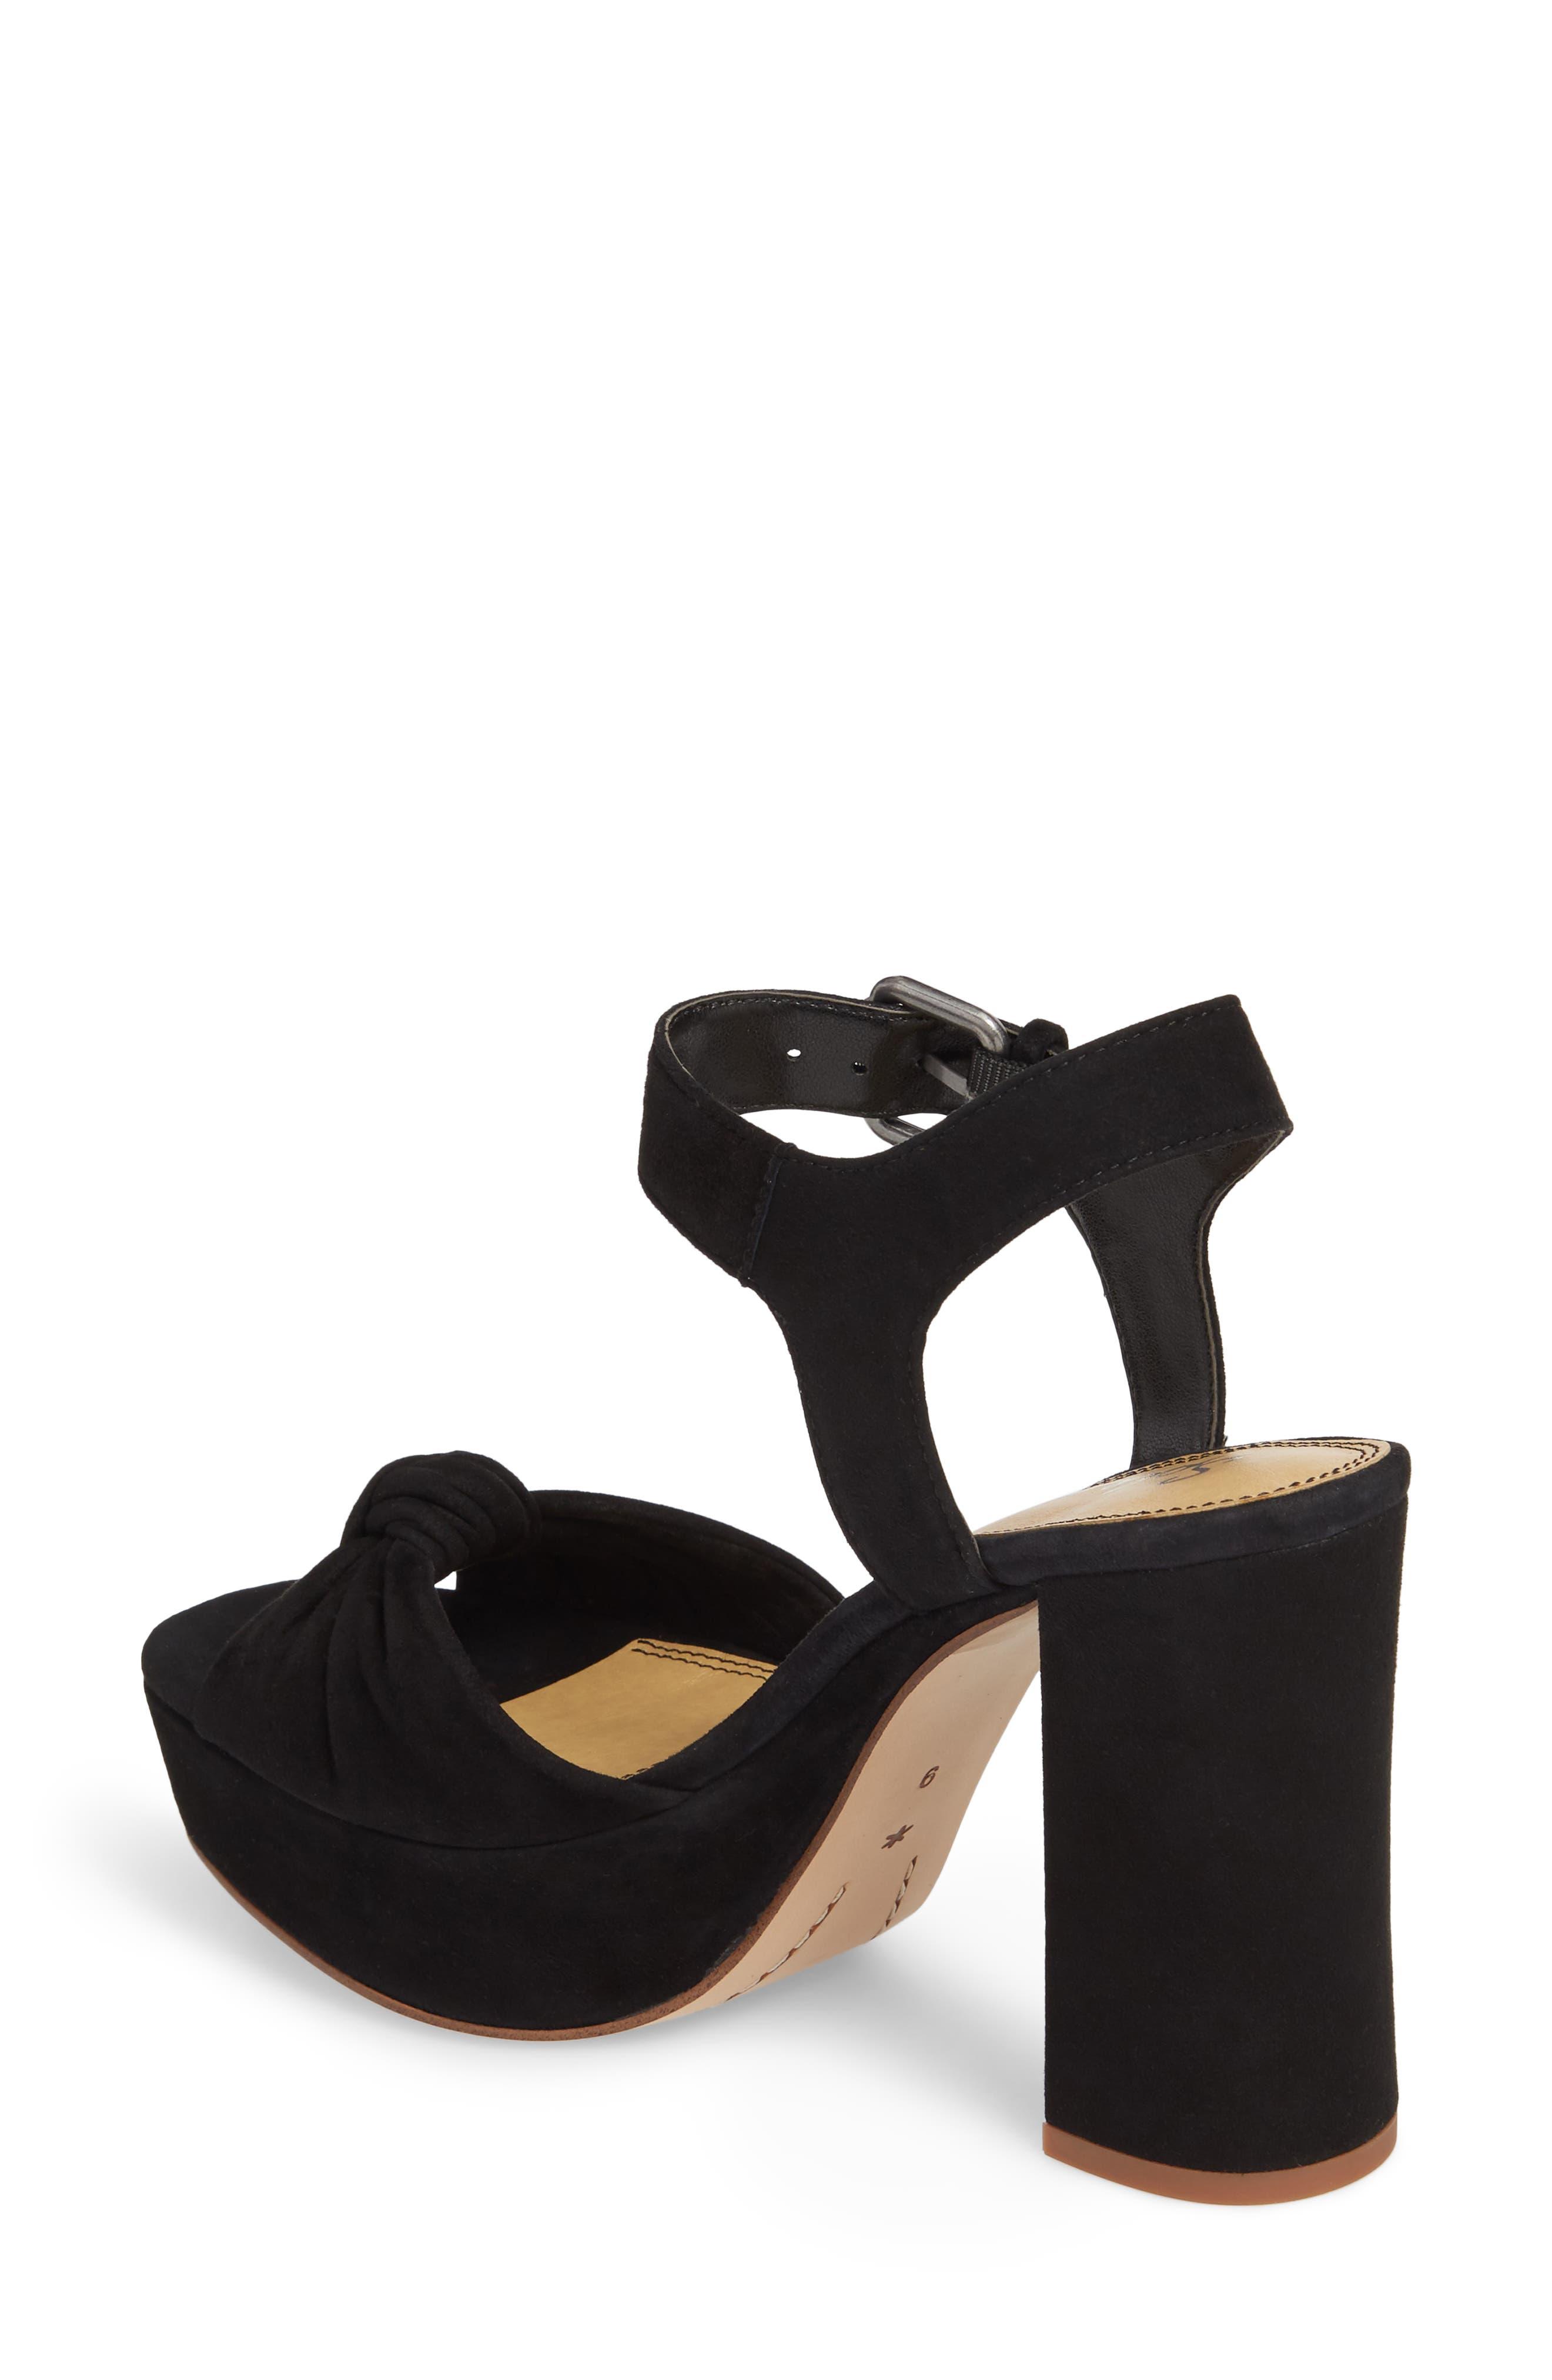 Bates Platform Sandal,                             Alternate thumbnail 2, color,                             BLACK SUEDE